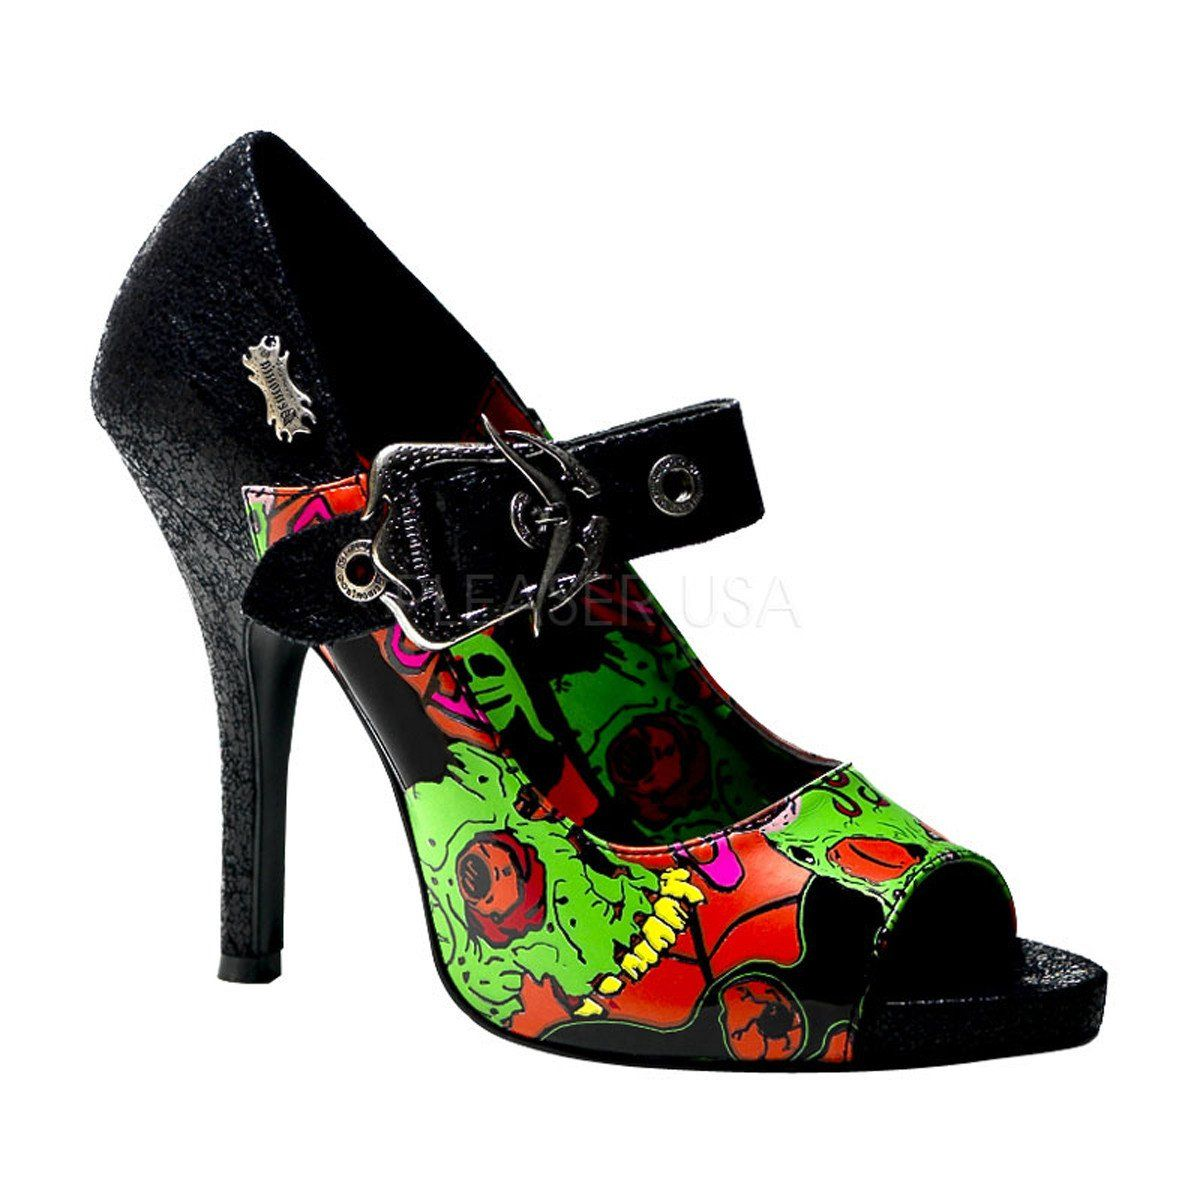 Demonia ZOMBIE 07 Black Turtle Pu Women's Heels